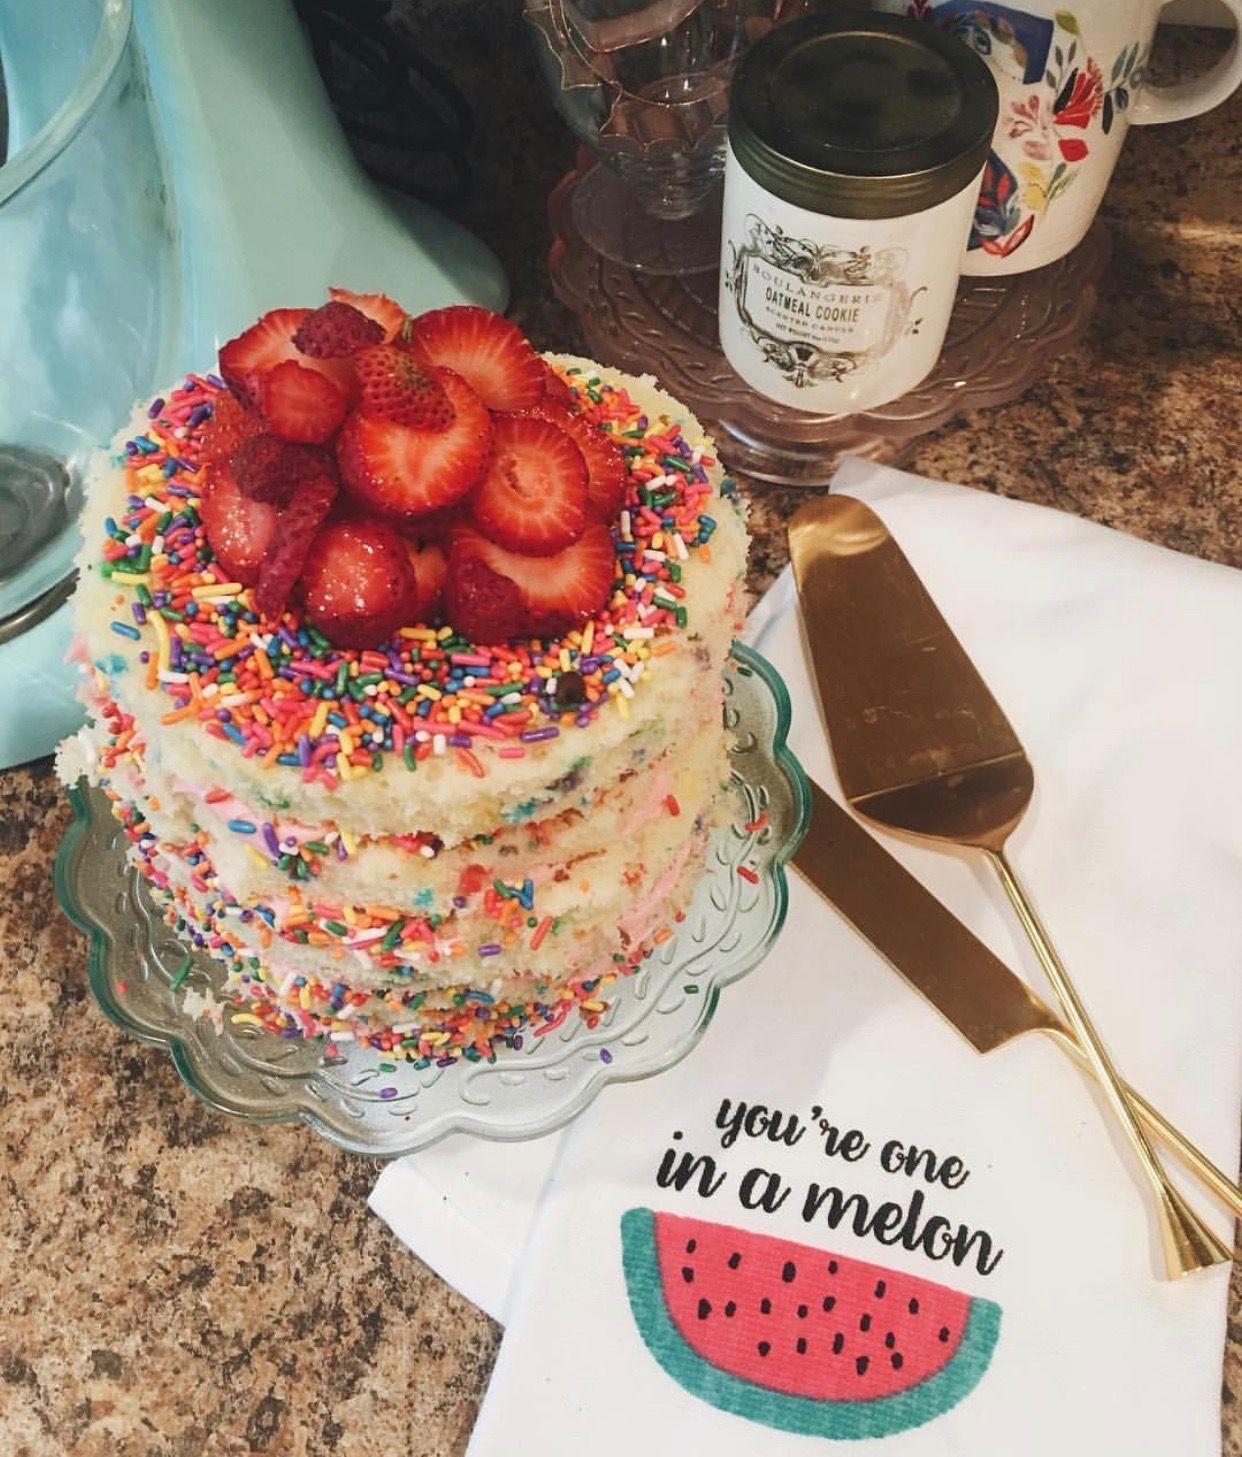 Admirable Total Cake Over 8 Easy Store Bought Cake Hacks Cake Hacks Funny Birthday Cards Online Bapapcheapnameinfo